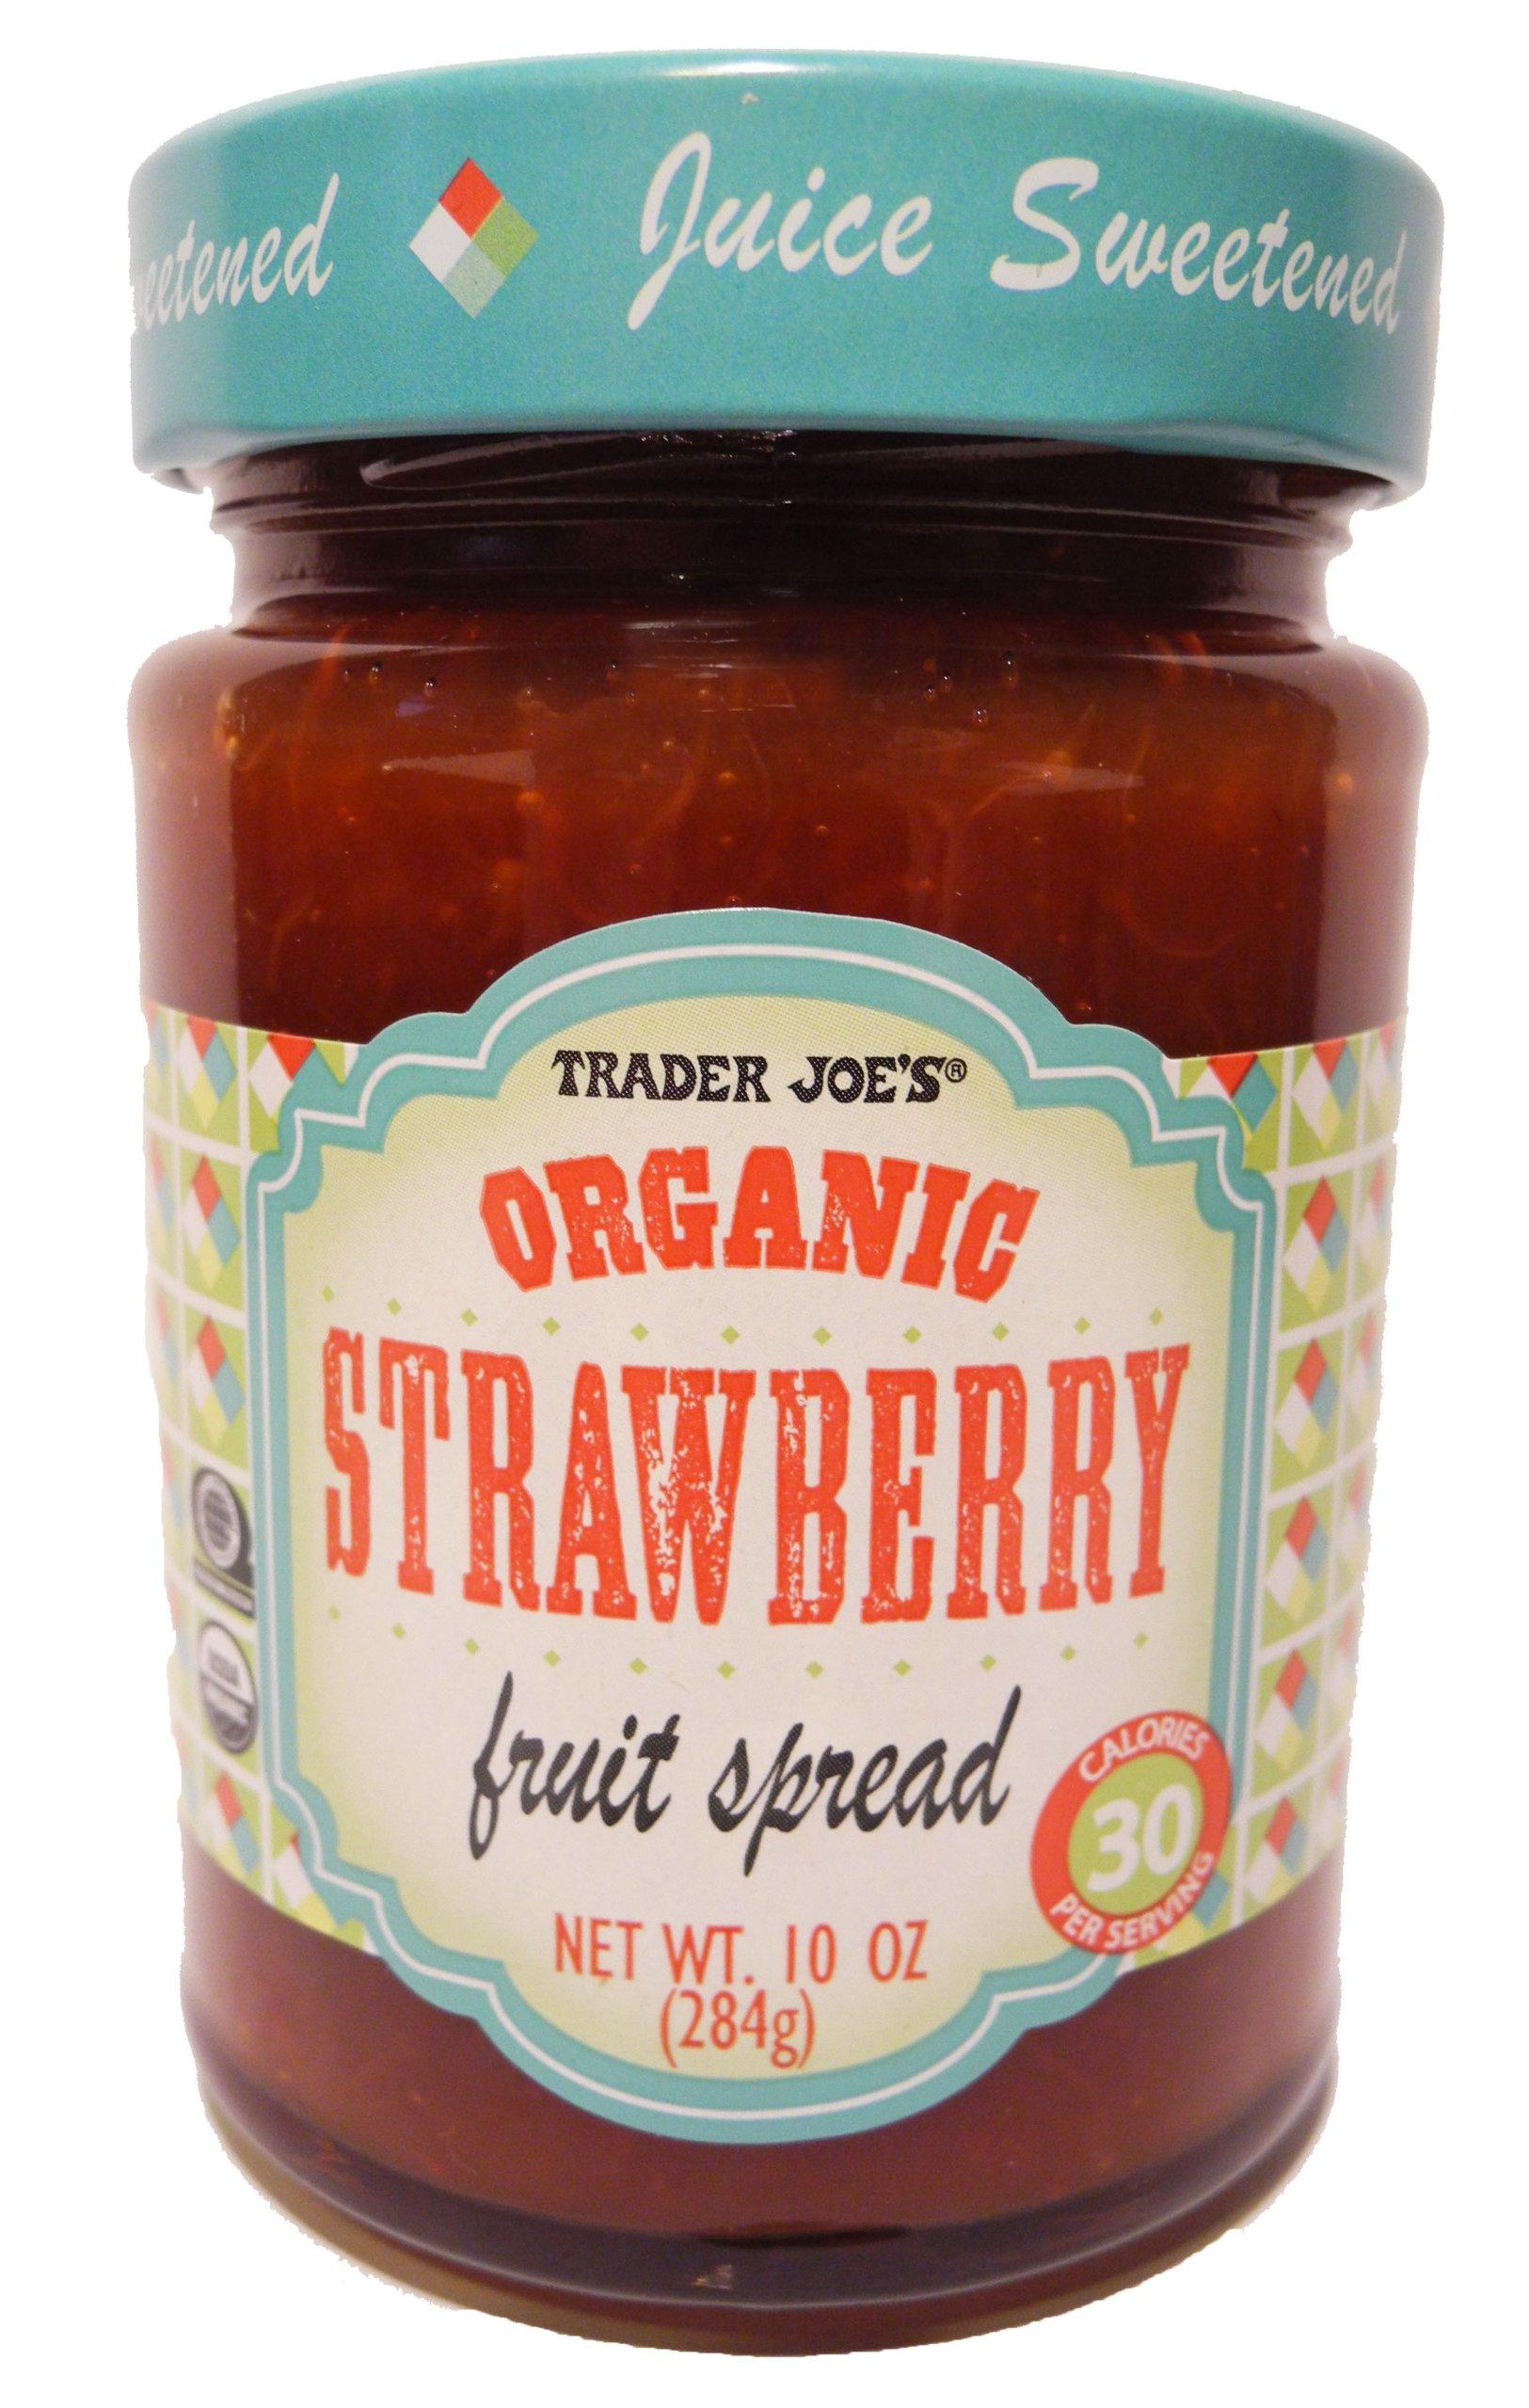 Trader Joe's Organic Strawberry Fruit Spread